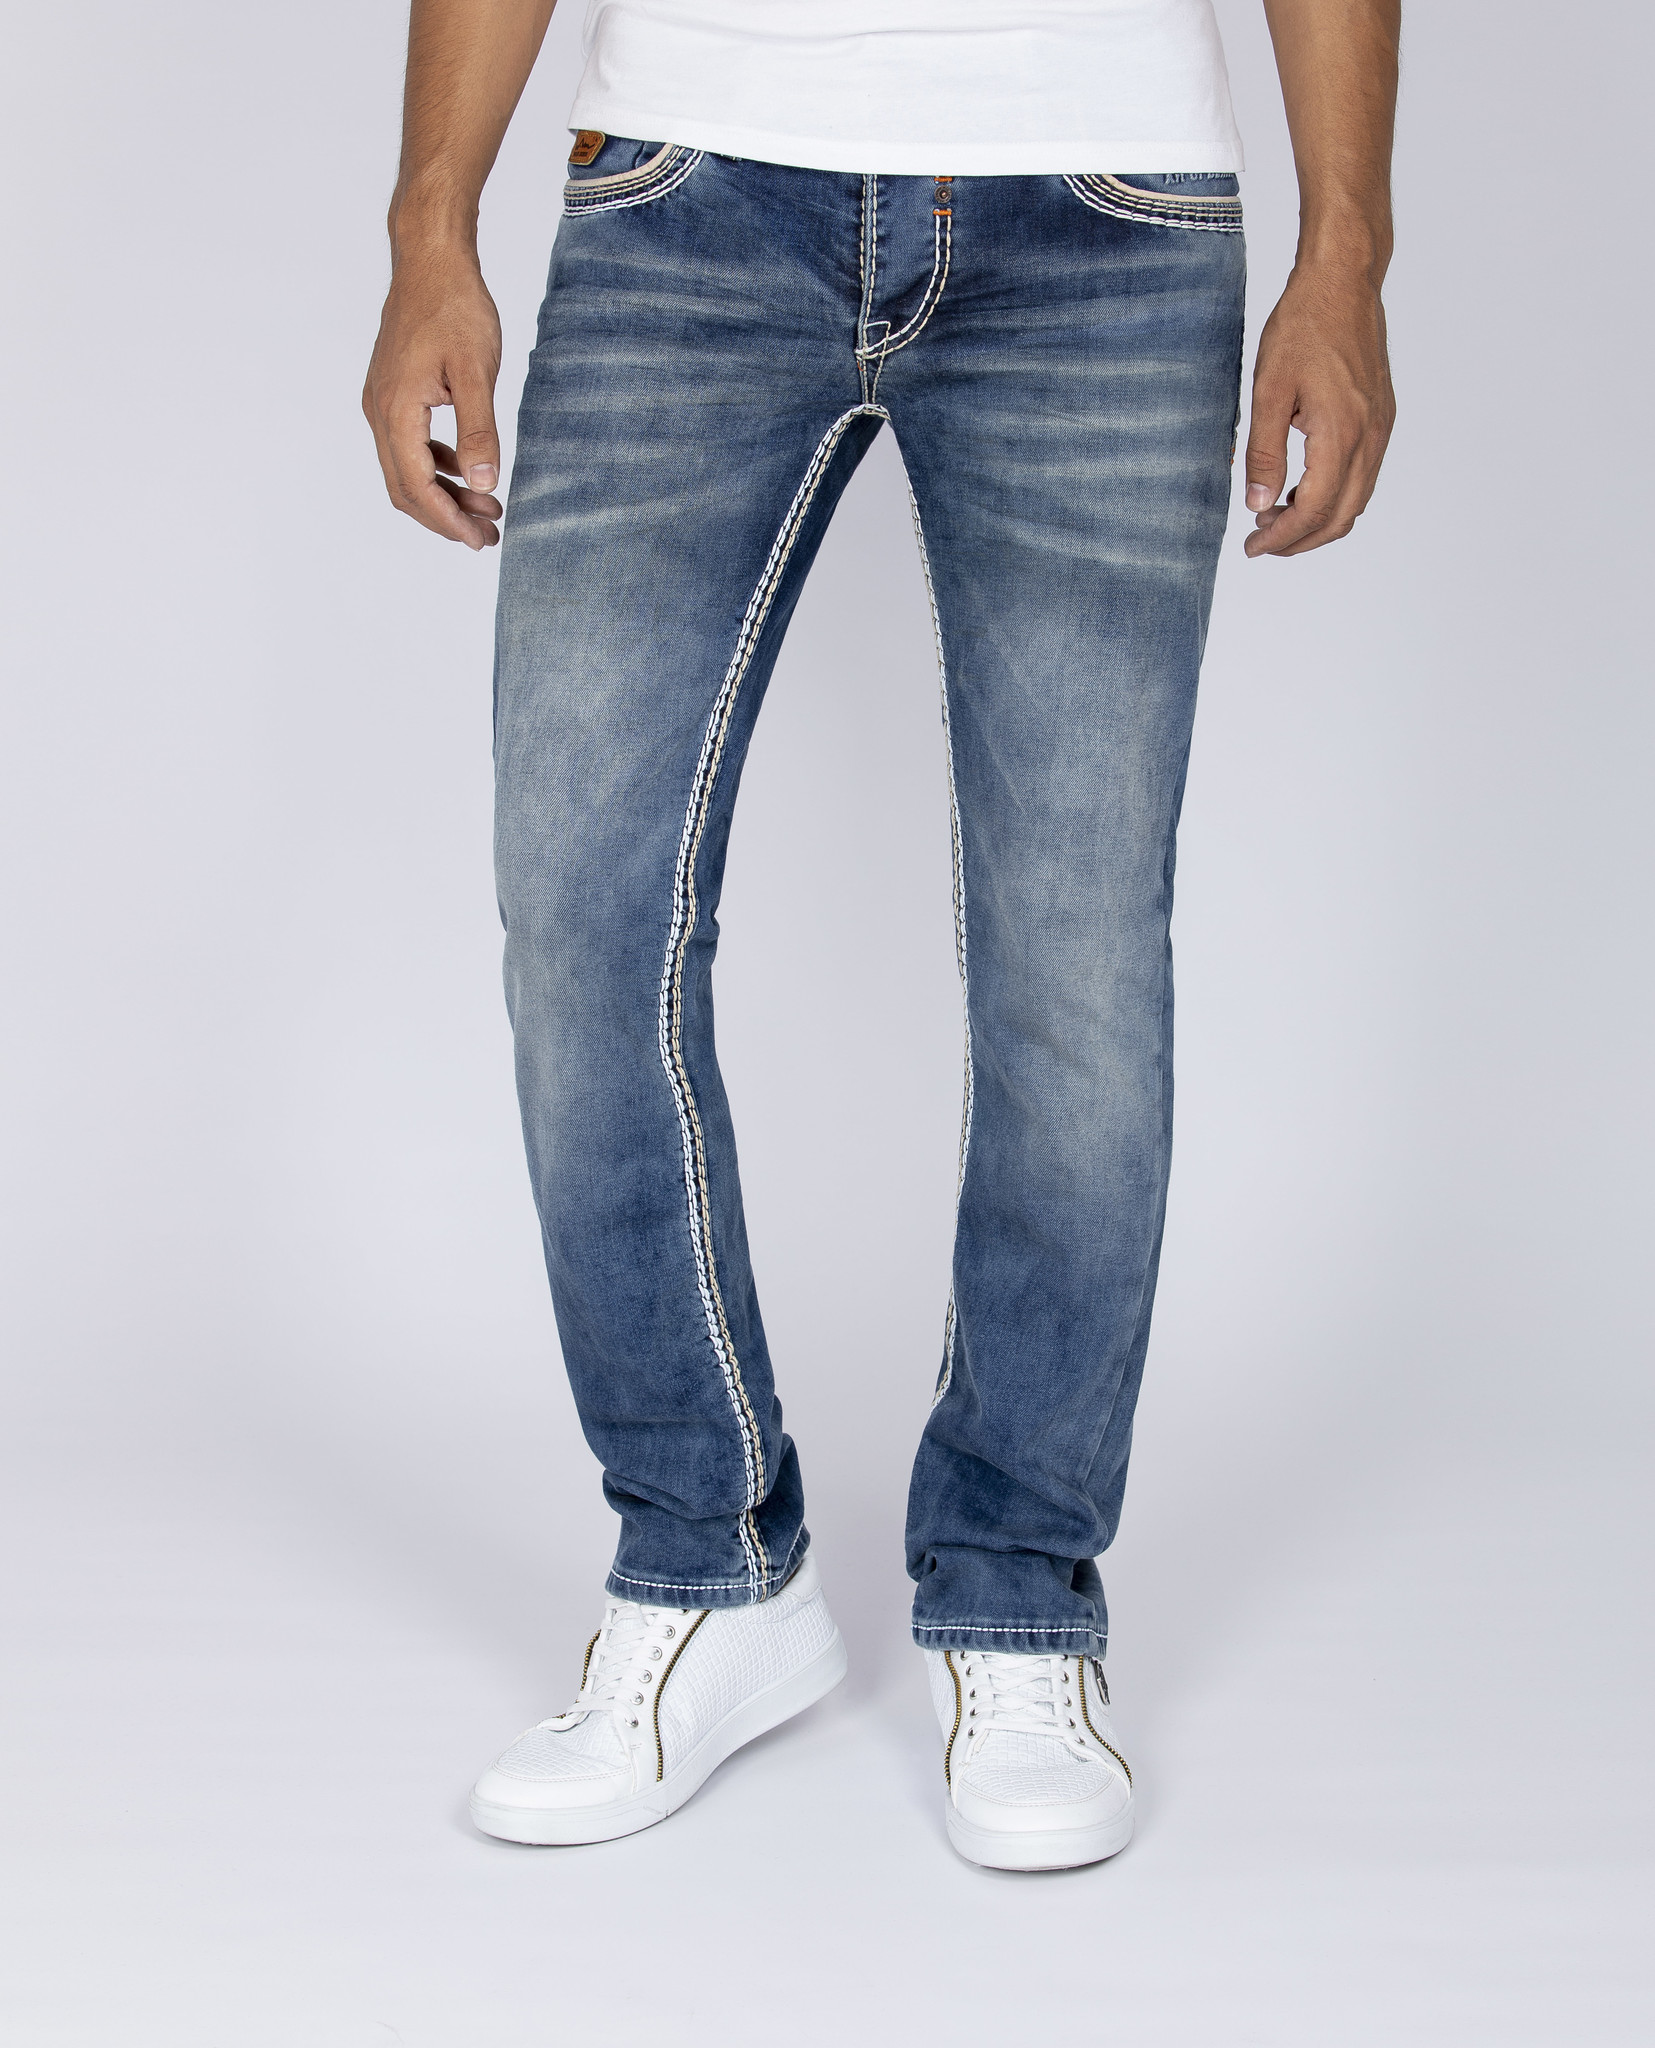 Wam Denim Jeans  Maat: 40/34